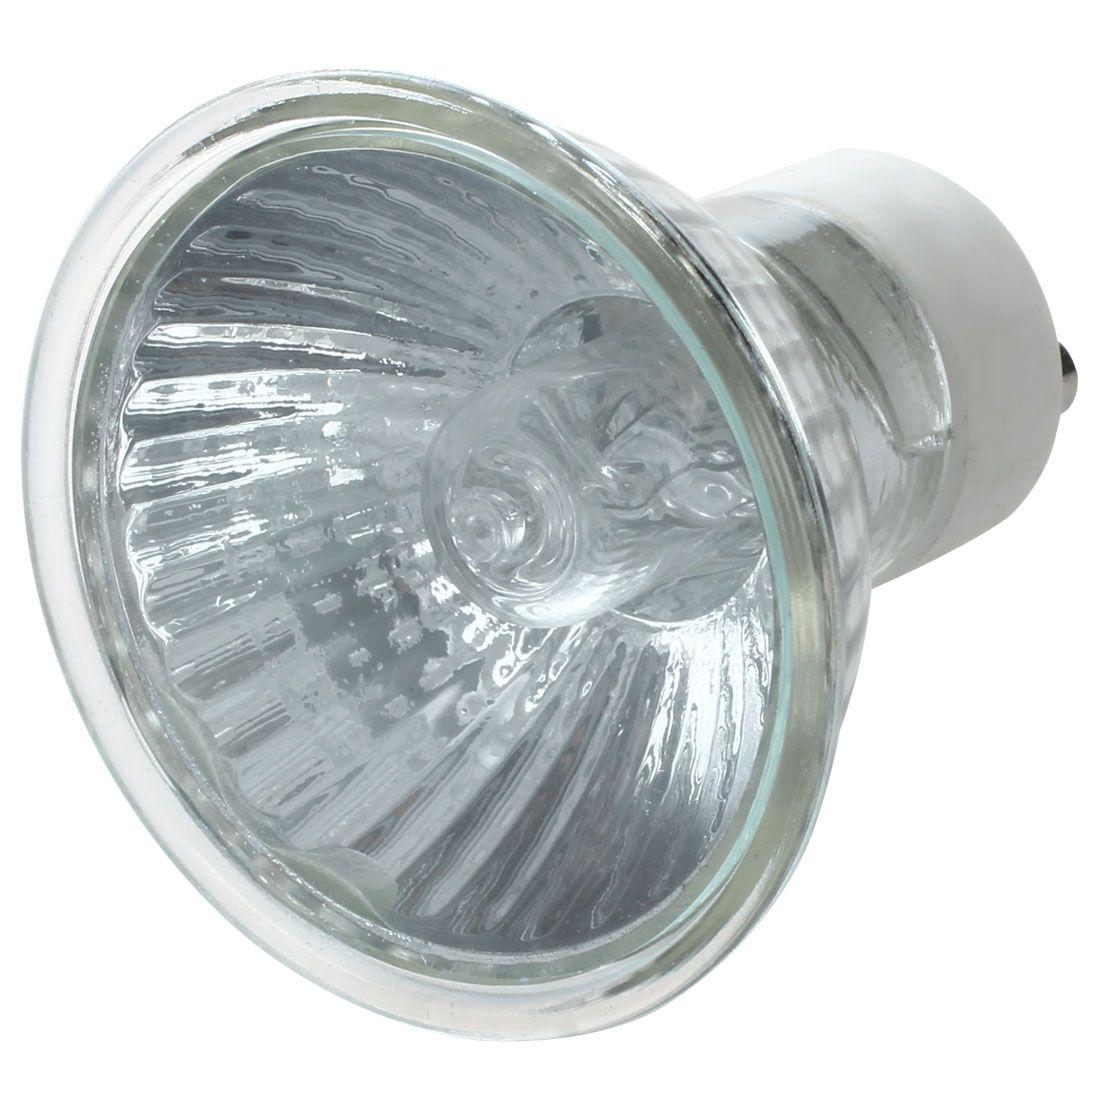 New Halogen Lamp Light Lamp Super Hell GU 10 + C 50W 220V